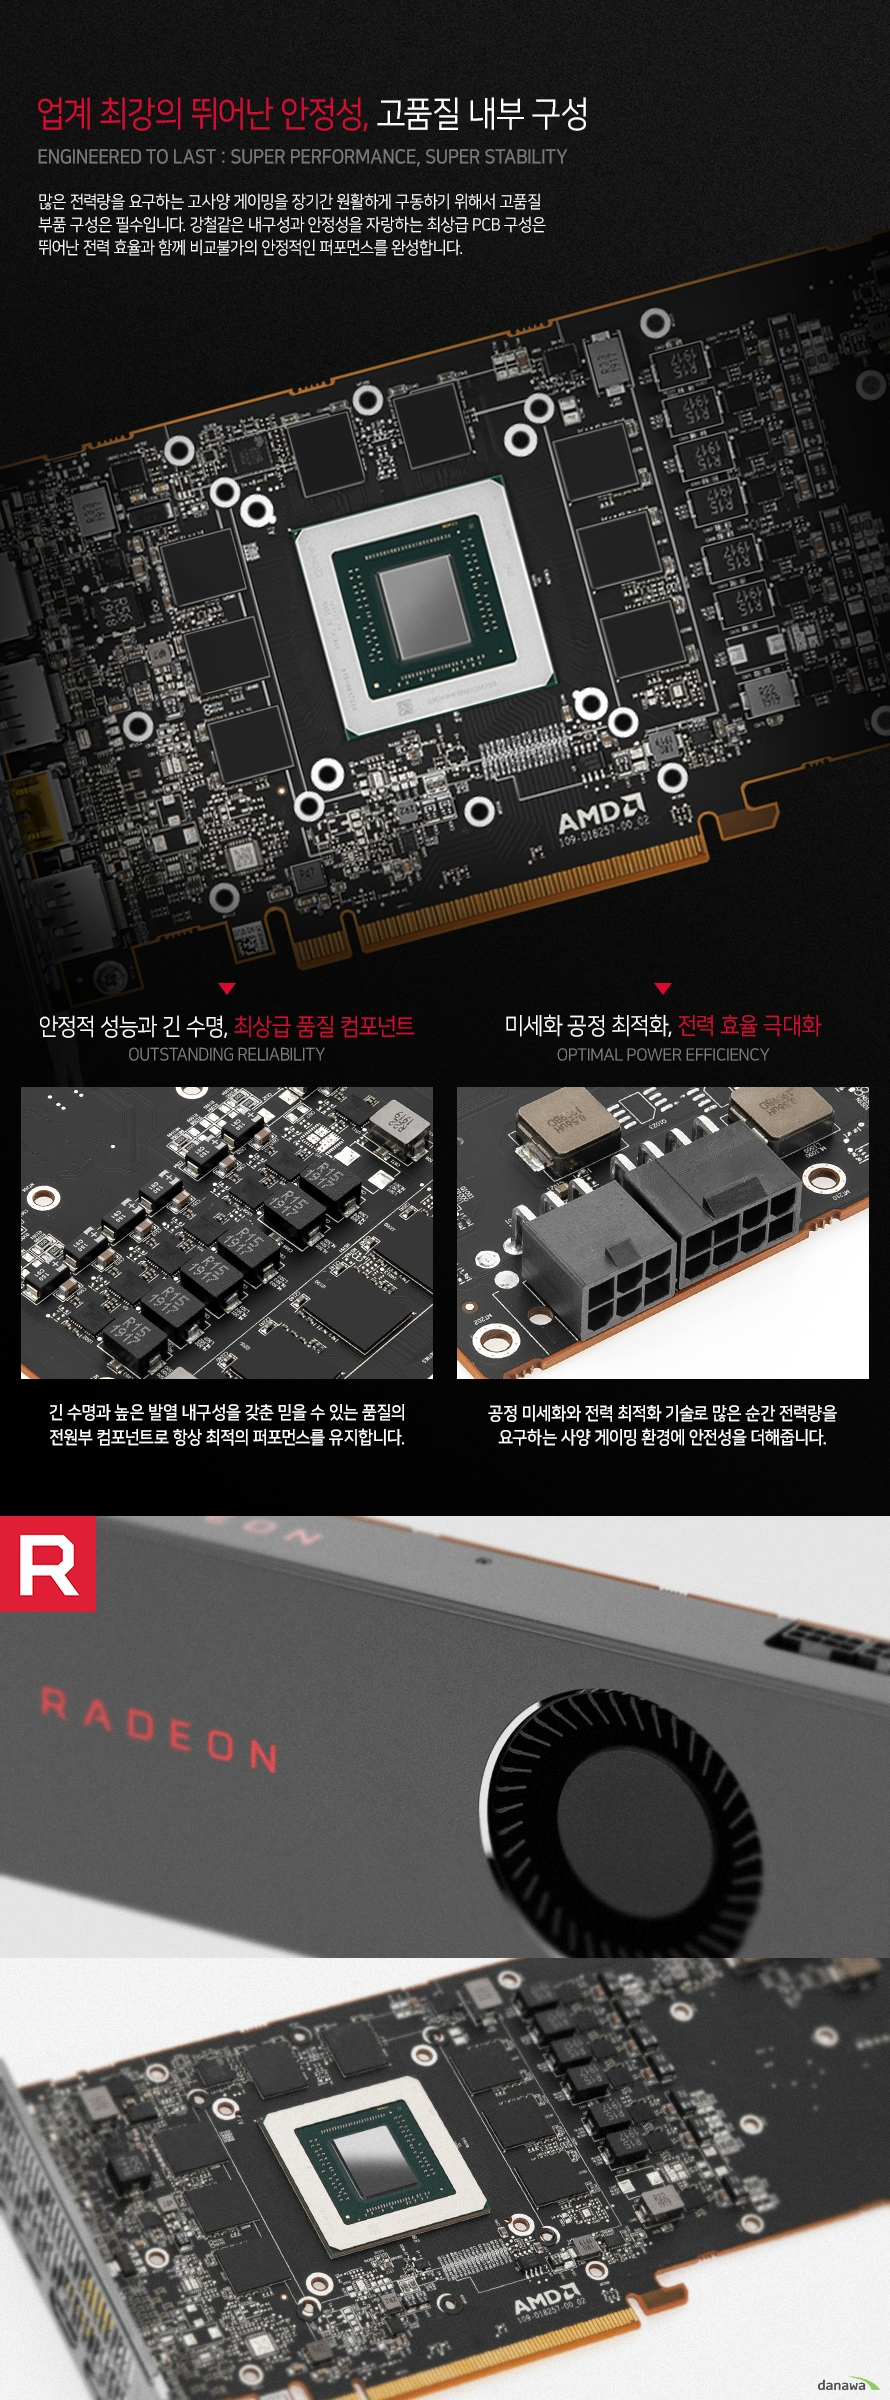 ASRock  라데온 RX 5700 D6 8GB 에즈윈